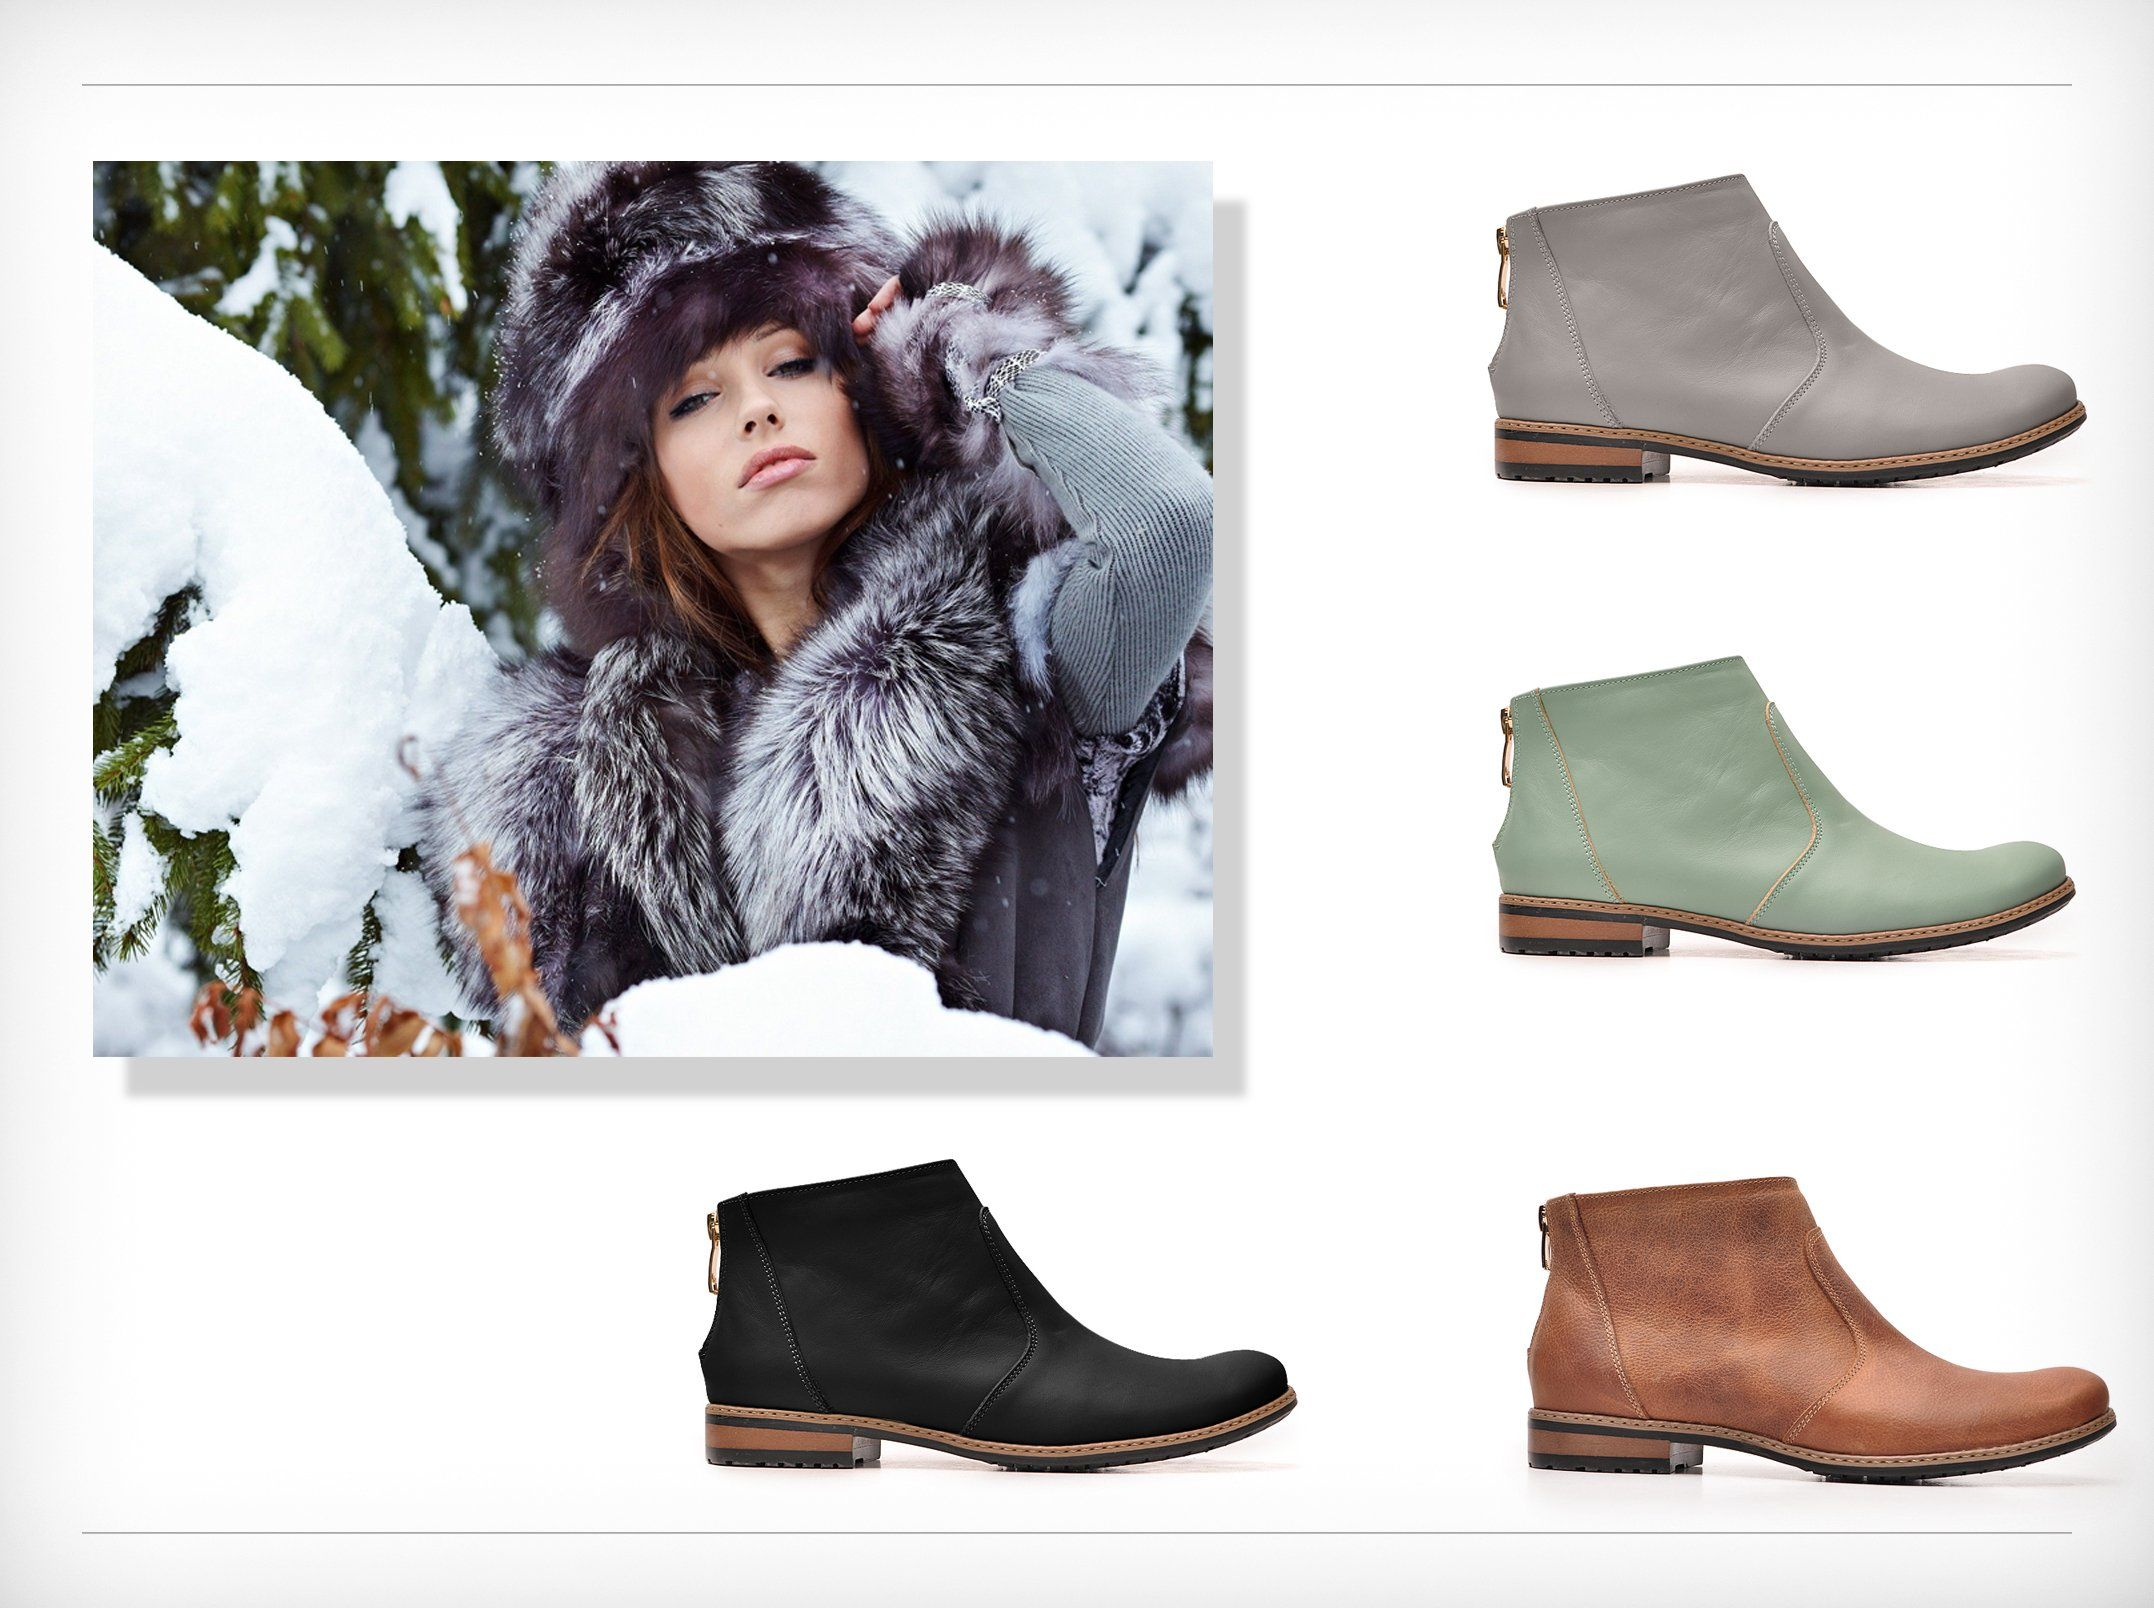 Odjazdowe Botki Noevision Jesien 2016 6411117930 Oficjalne Archiwum Allegro Chelsea Boots Shoes Ankle Boot